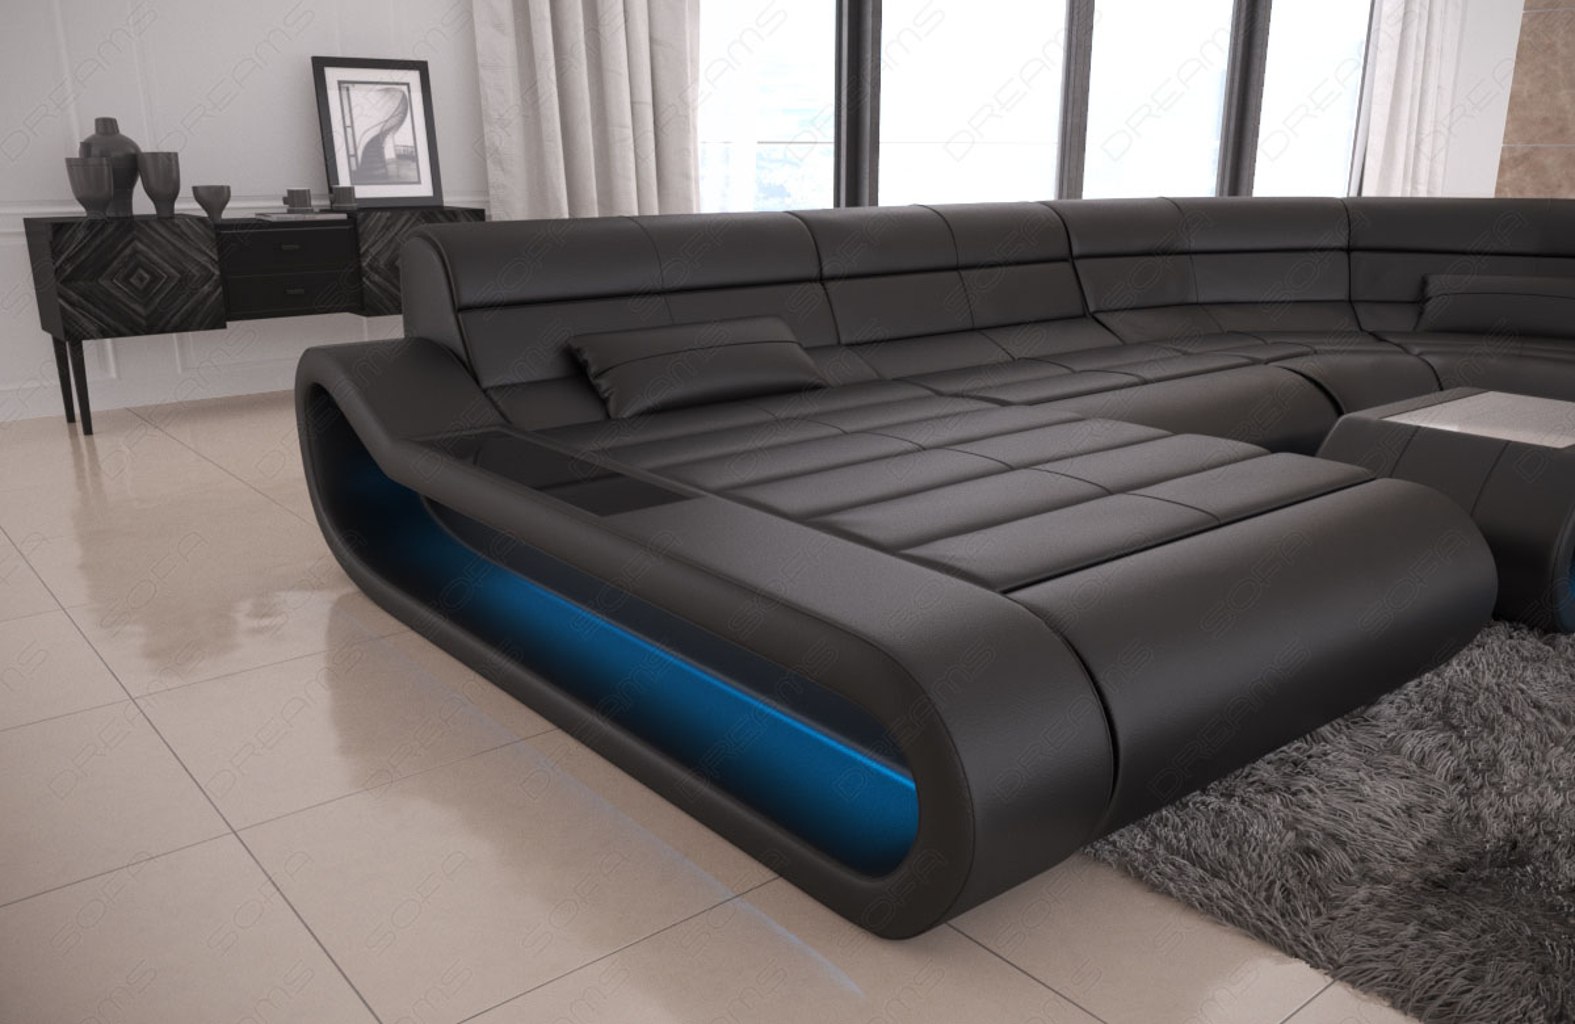 Wohnlandschaft Leder Bigsofa Couch Ecksofa Ottomane Concept Xxl Led